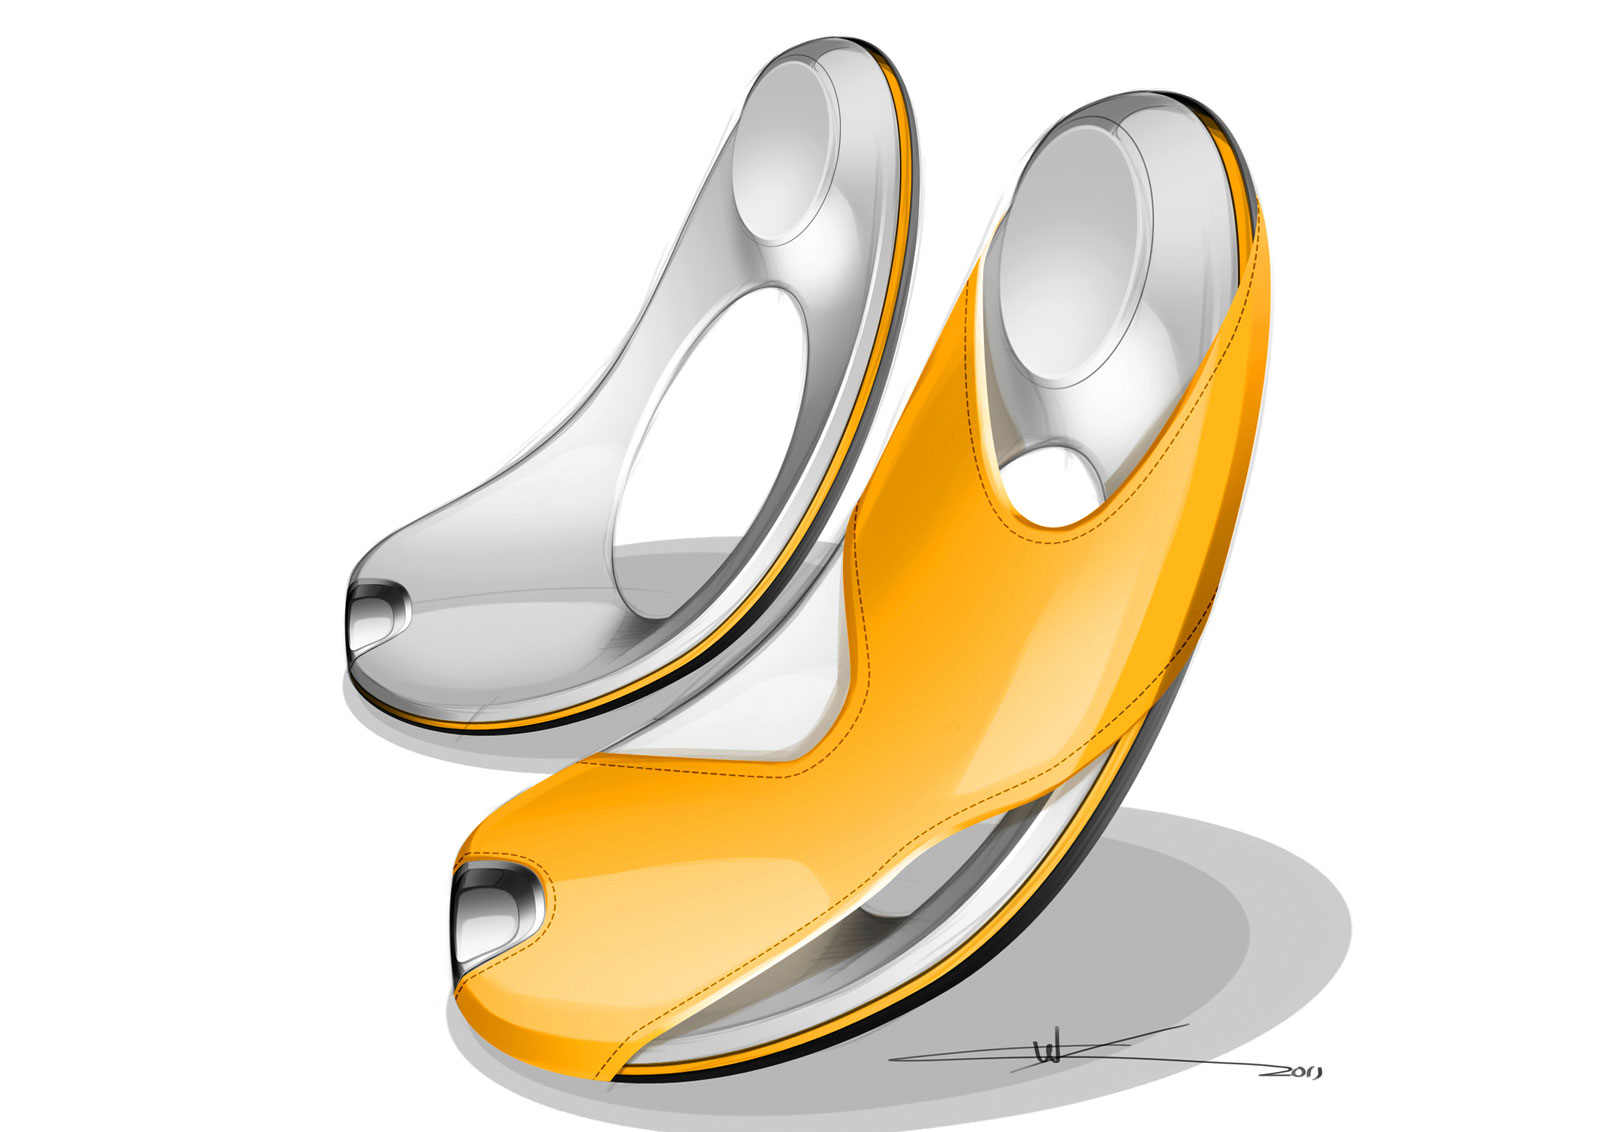 Smart For Us Concept Seats Design Sketch Car Body Design